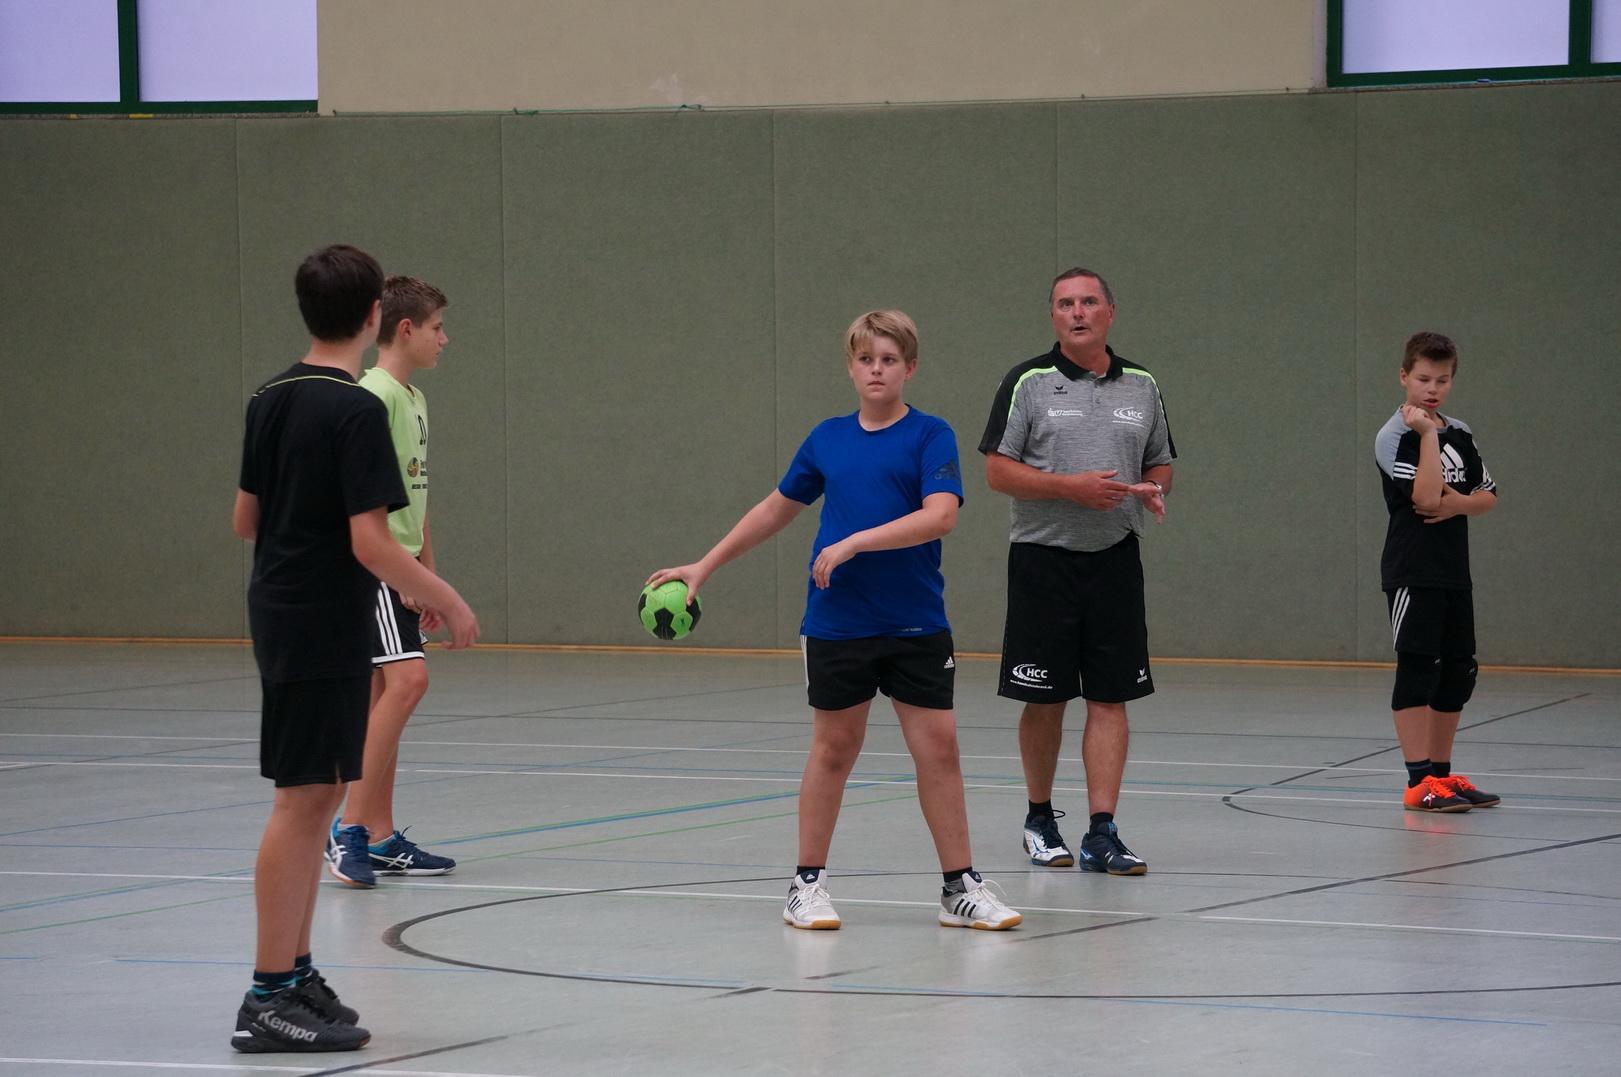 201808_Handballcamp_SDH_MG_100w